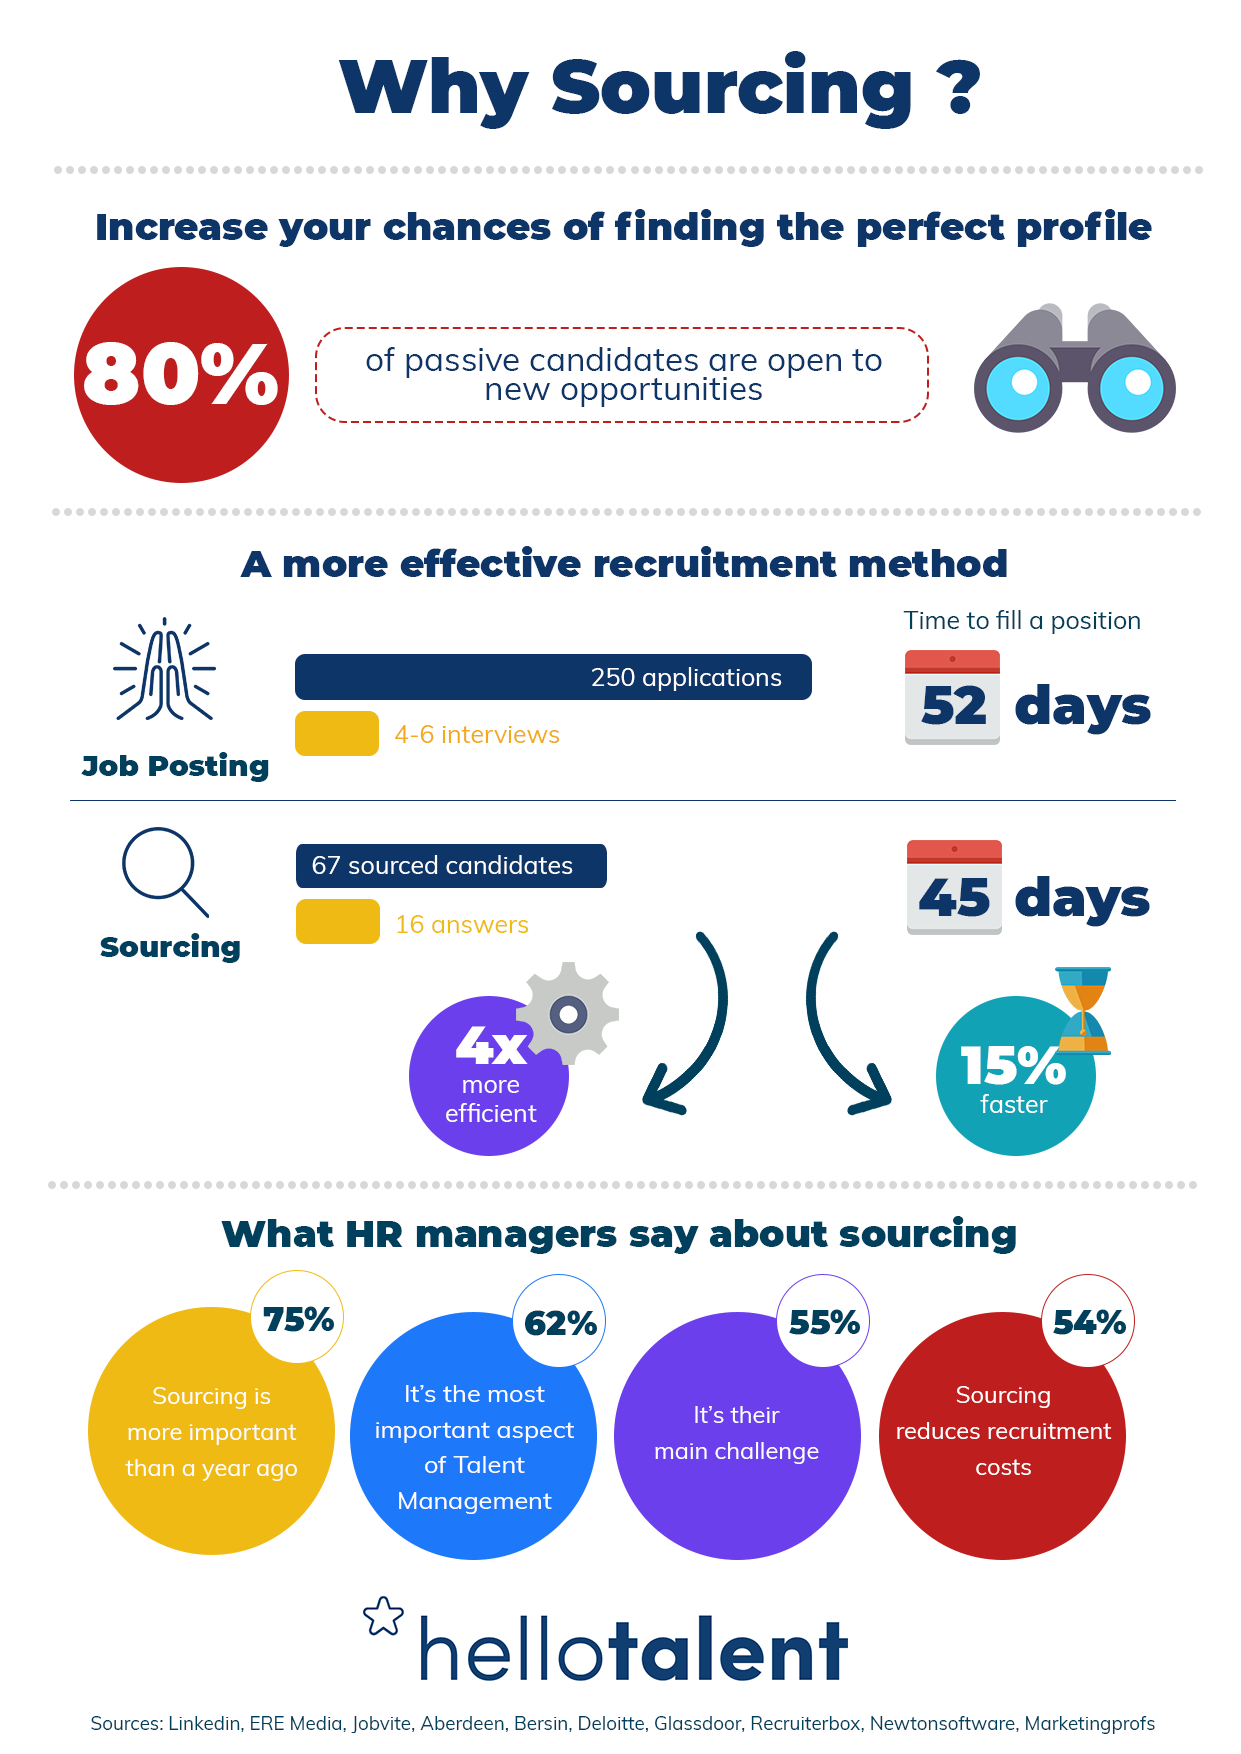 e-recruitment-candidate-sourcing